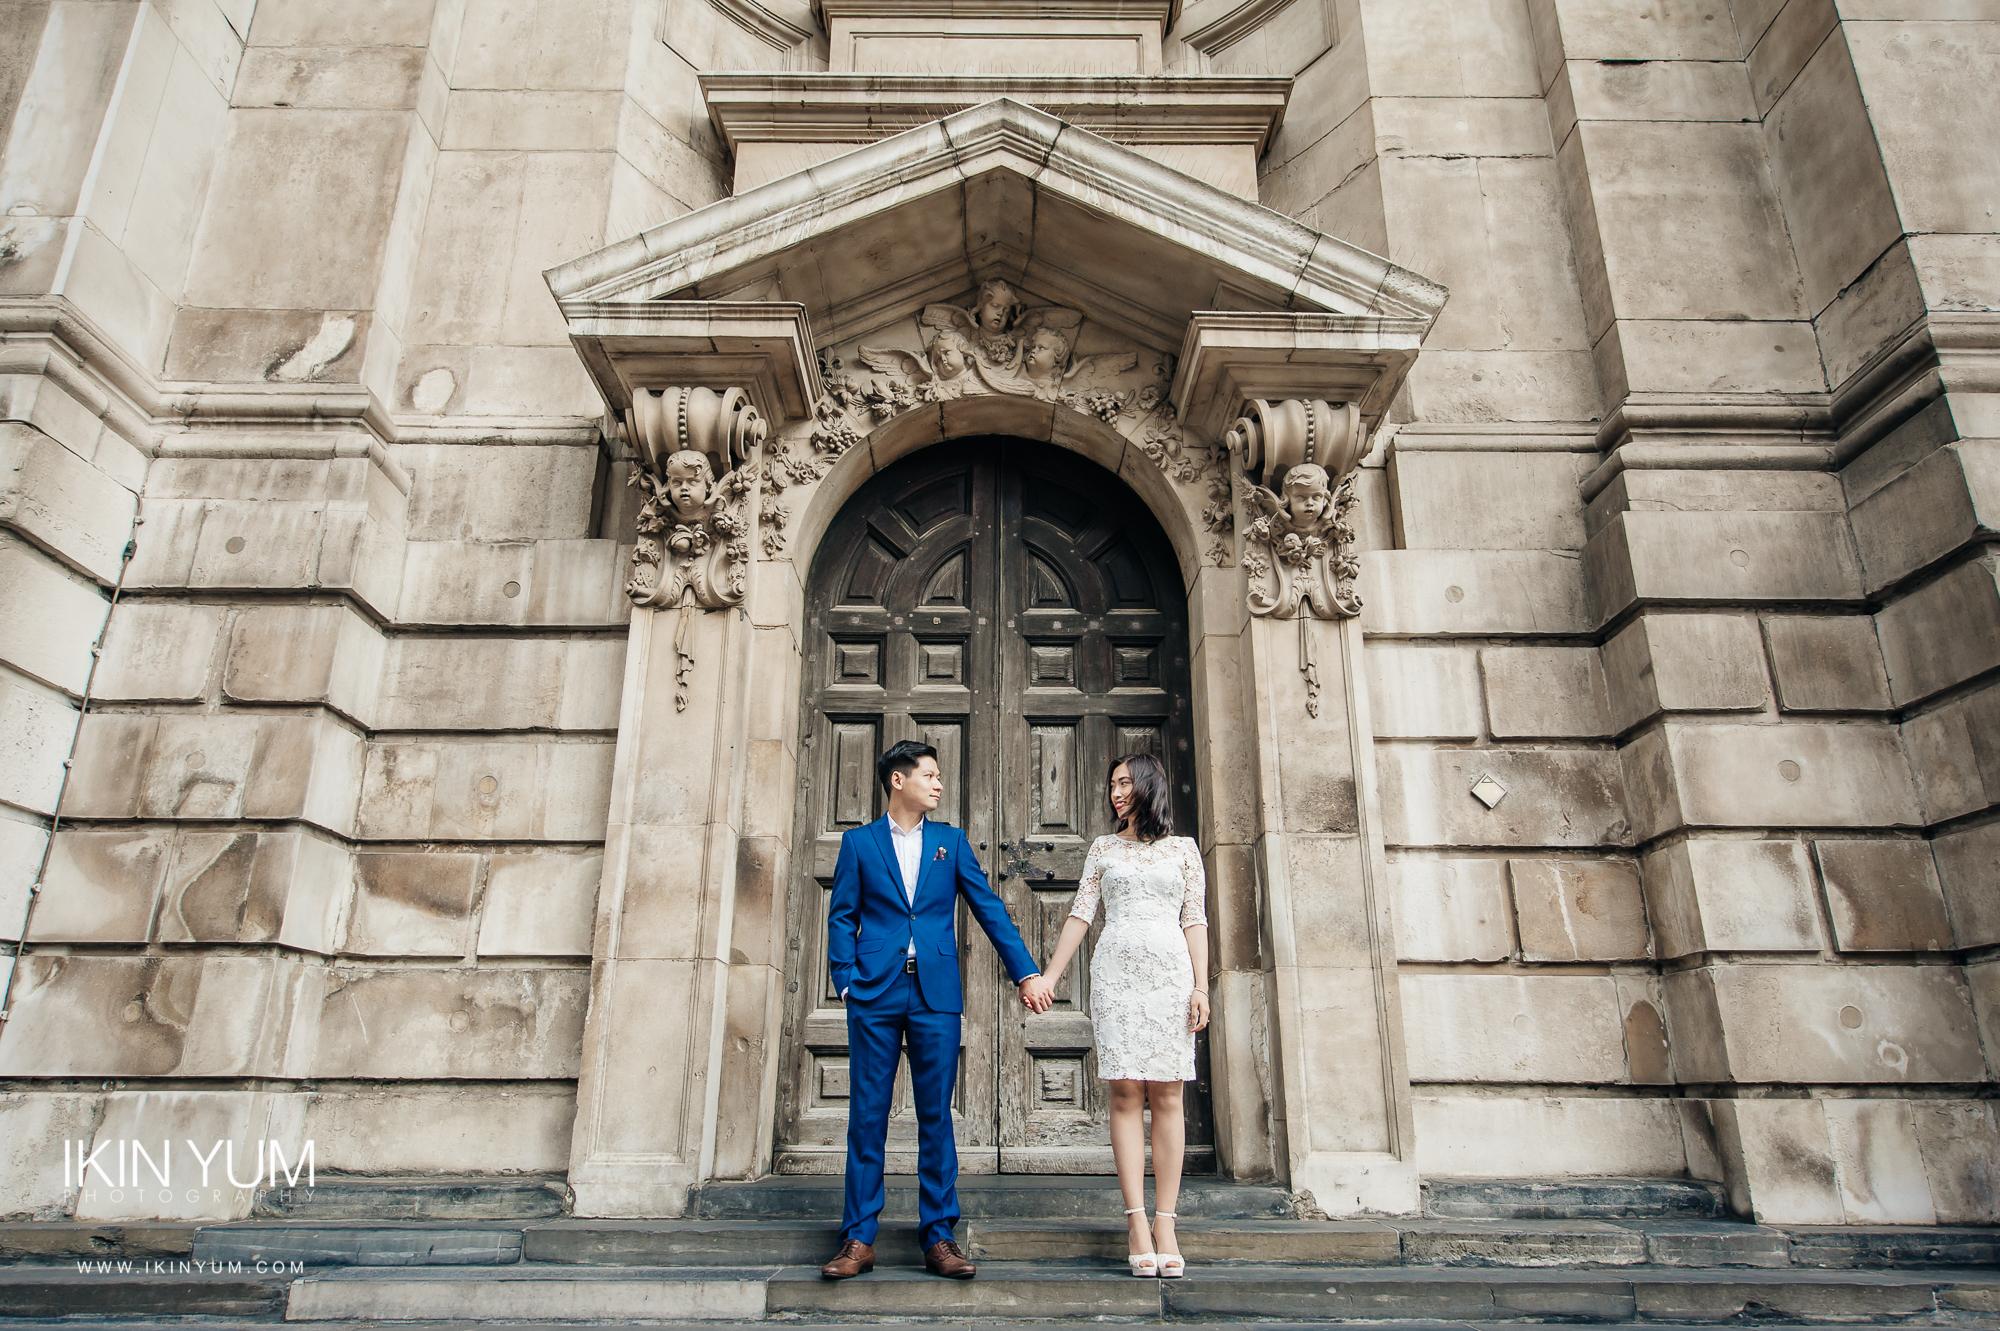 Natalie & Duncan Wedding Day - Ikin Yum Photography-092.jpg